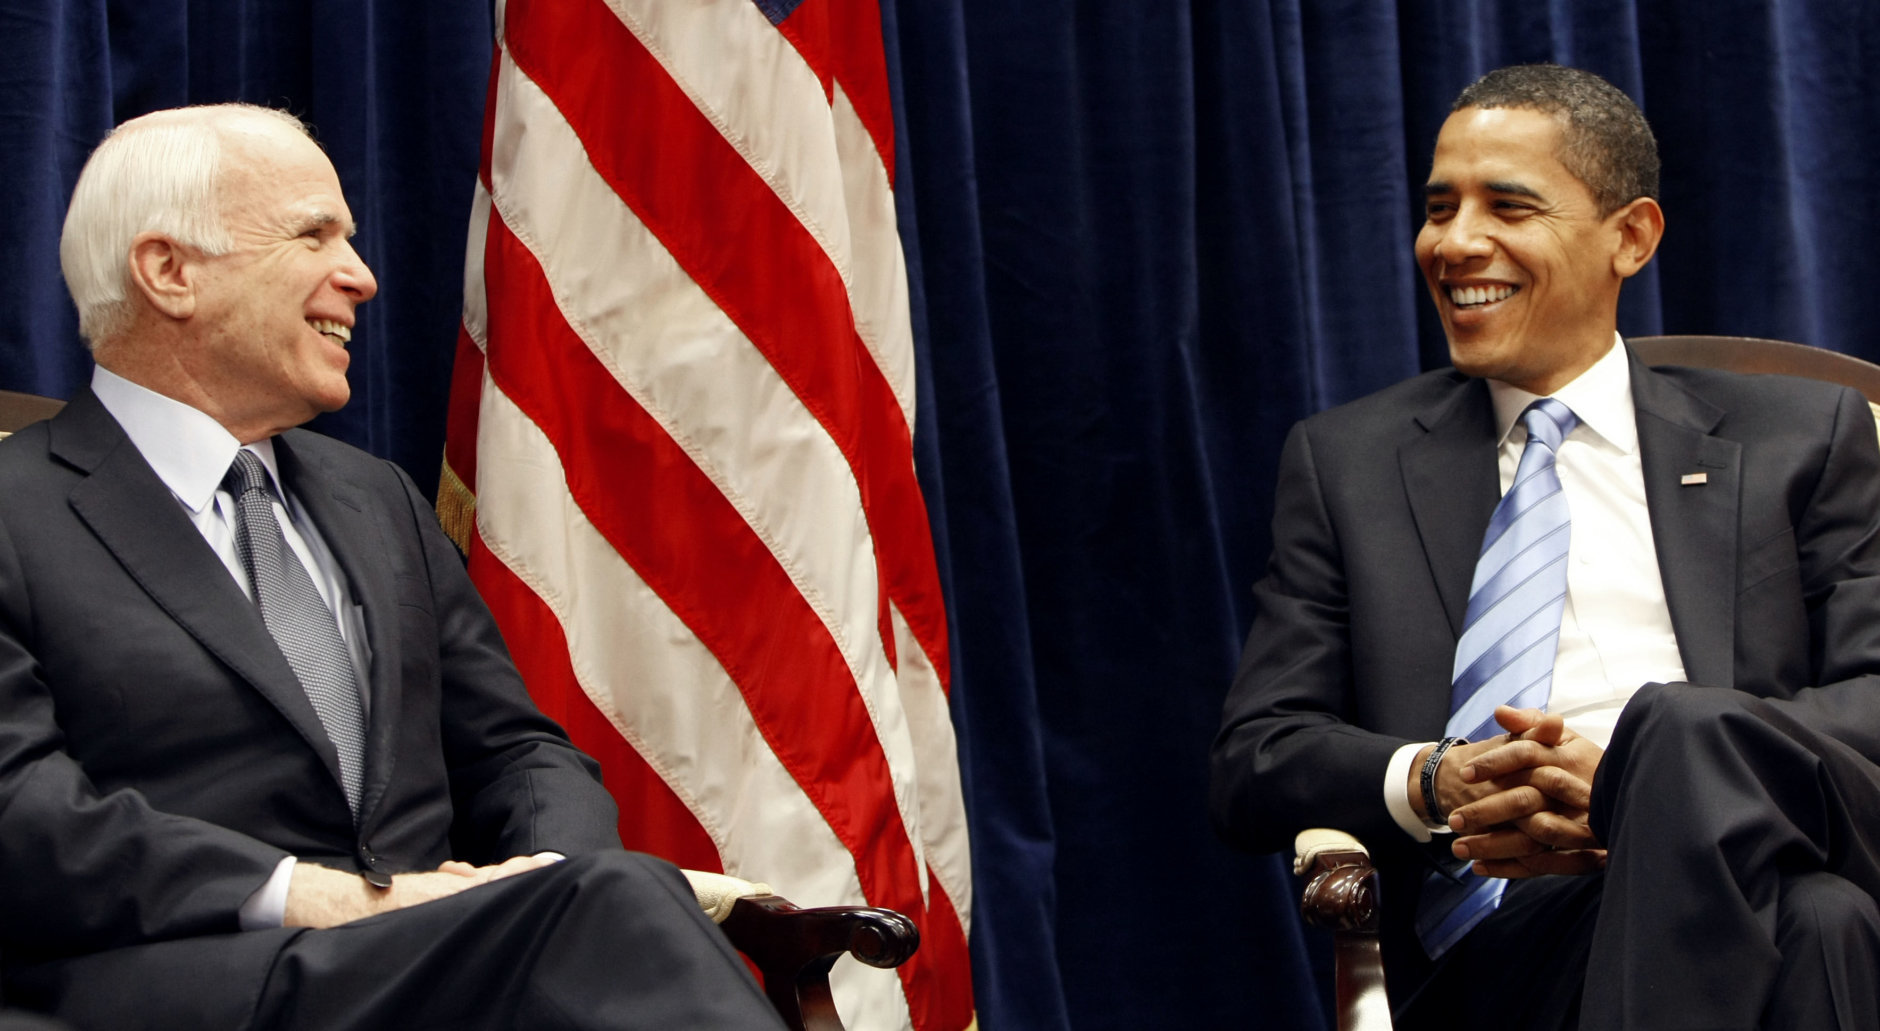 President-elect Barack Obama and Sen John McCain, R-Ariz. smile during their meeting at Obama's transition office in downtown Chicago, Monday, Nov. 17, 2008. (AP Photo/Pablo Martinez Monsivais)